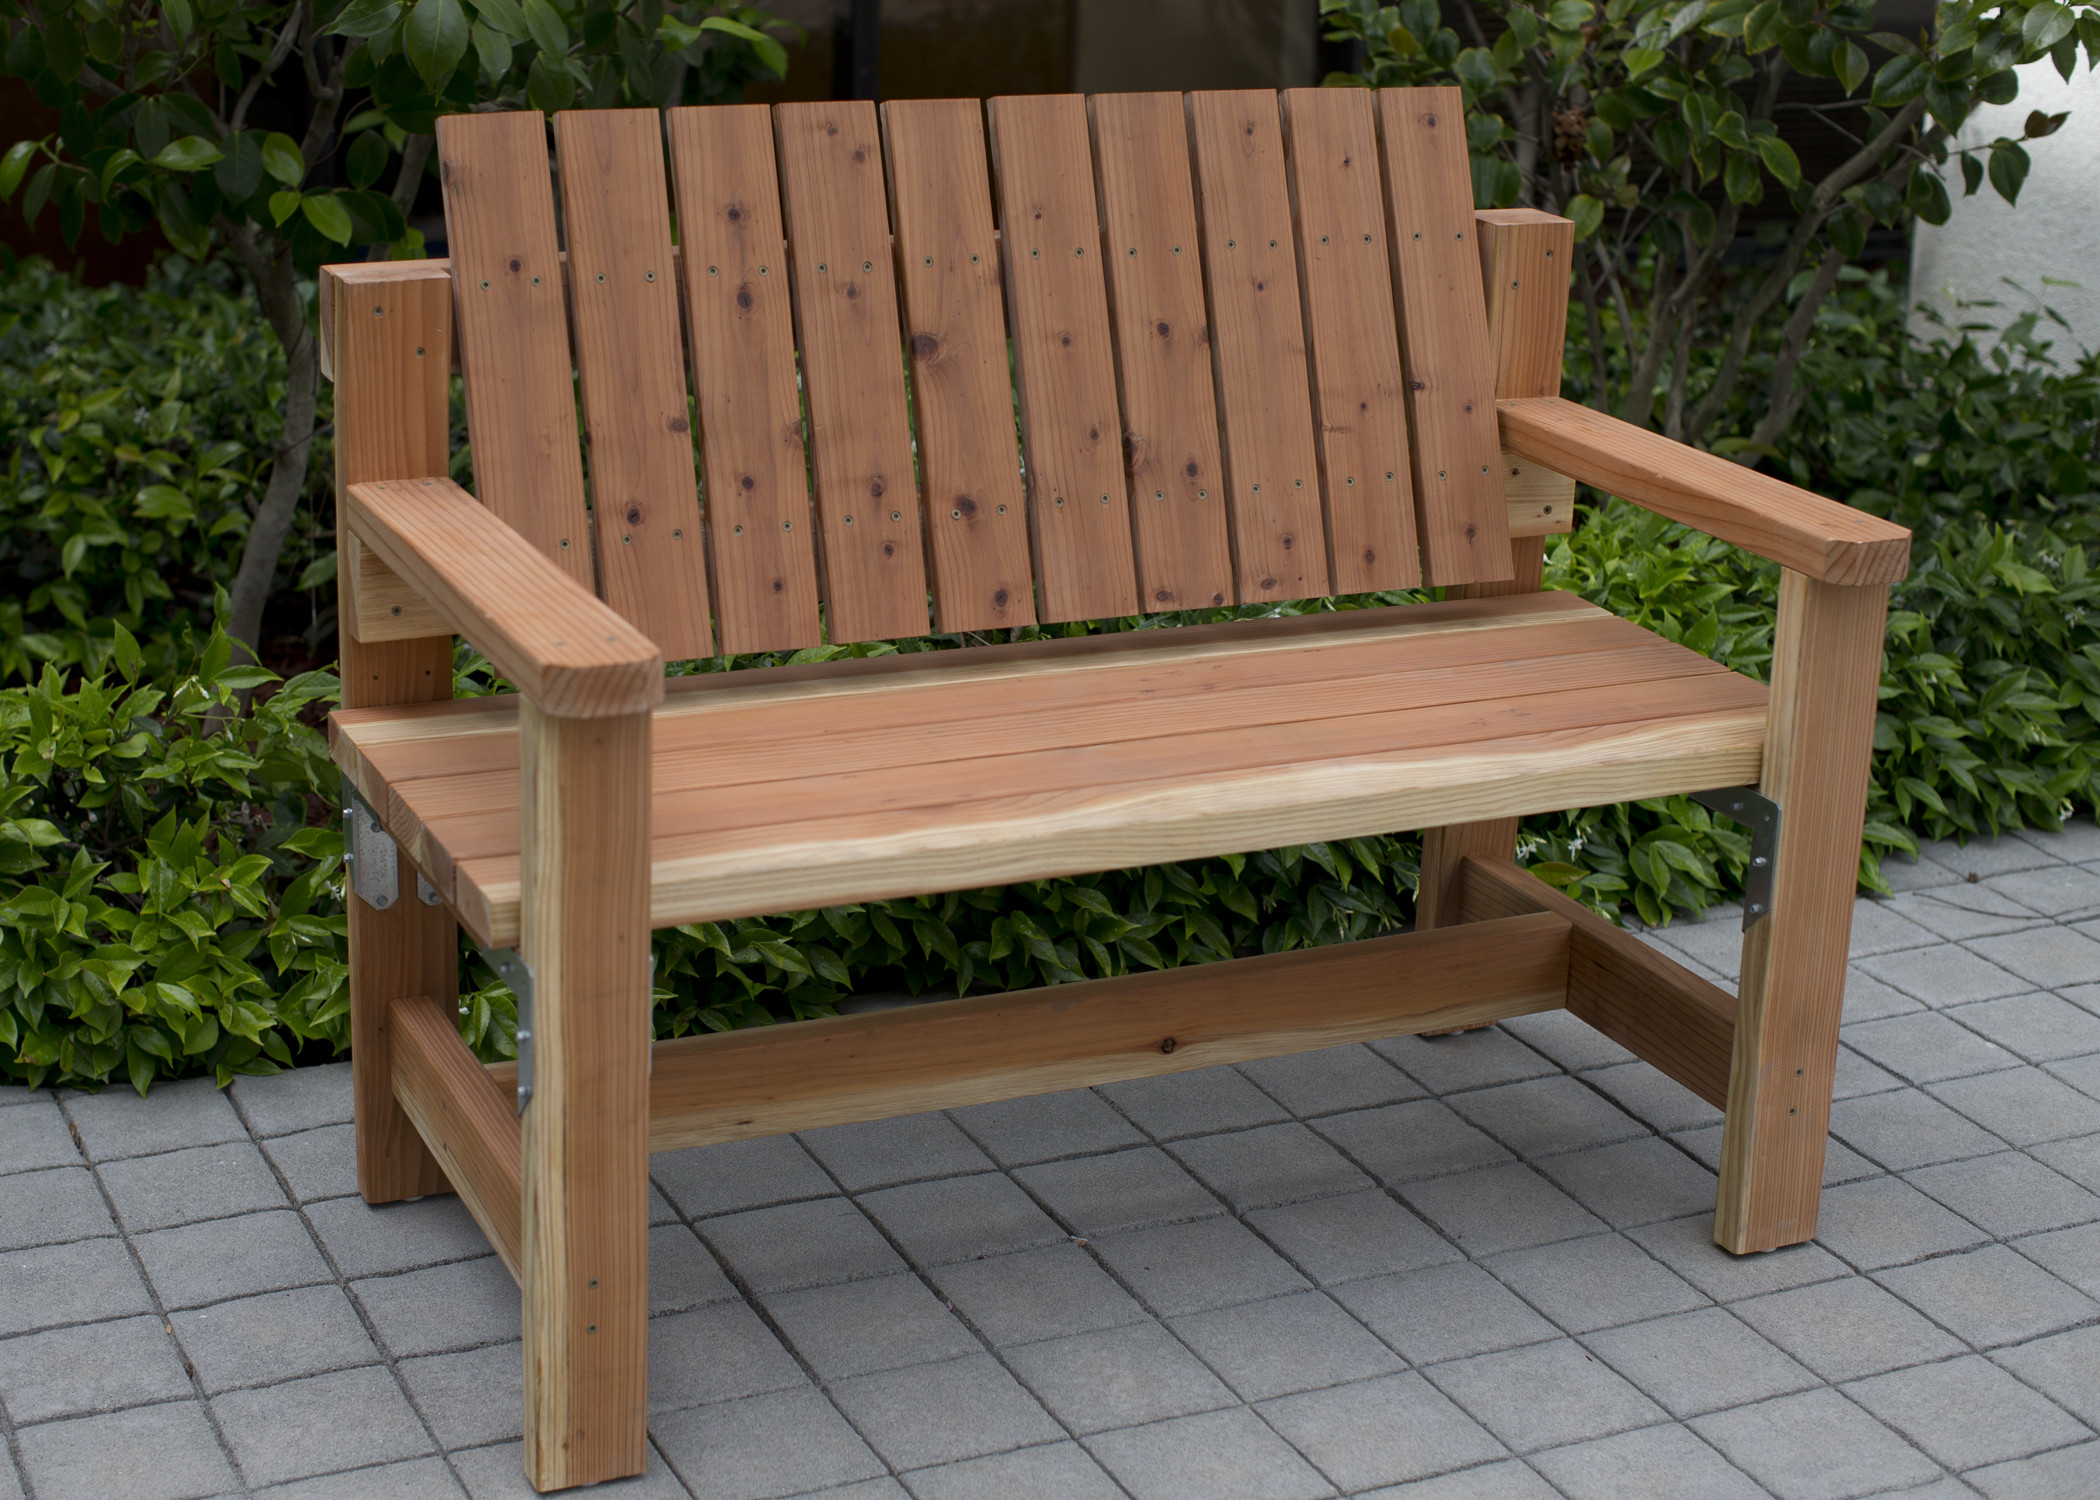 DIY Outdoor Workbench  DIY Garden Bench Preview DIY Done Right